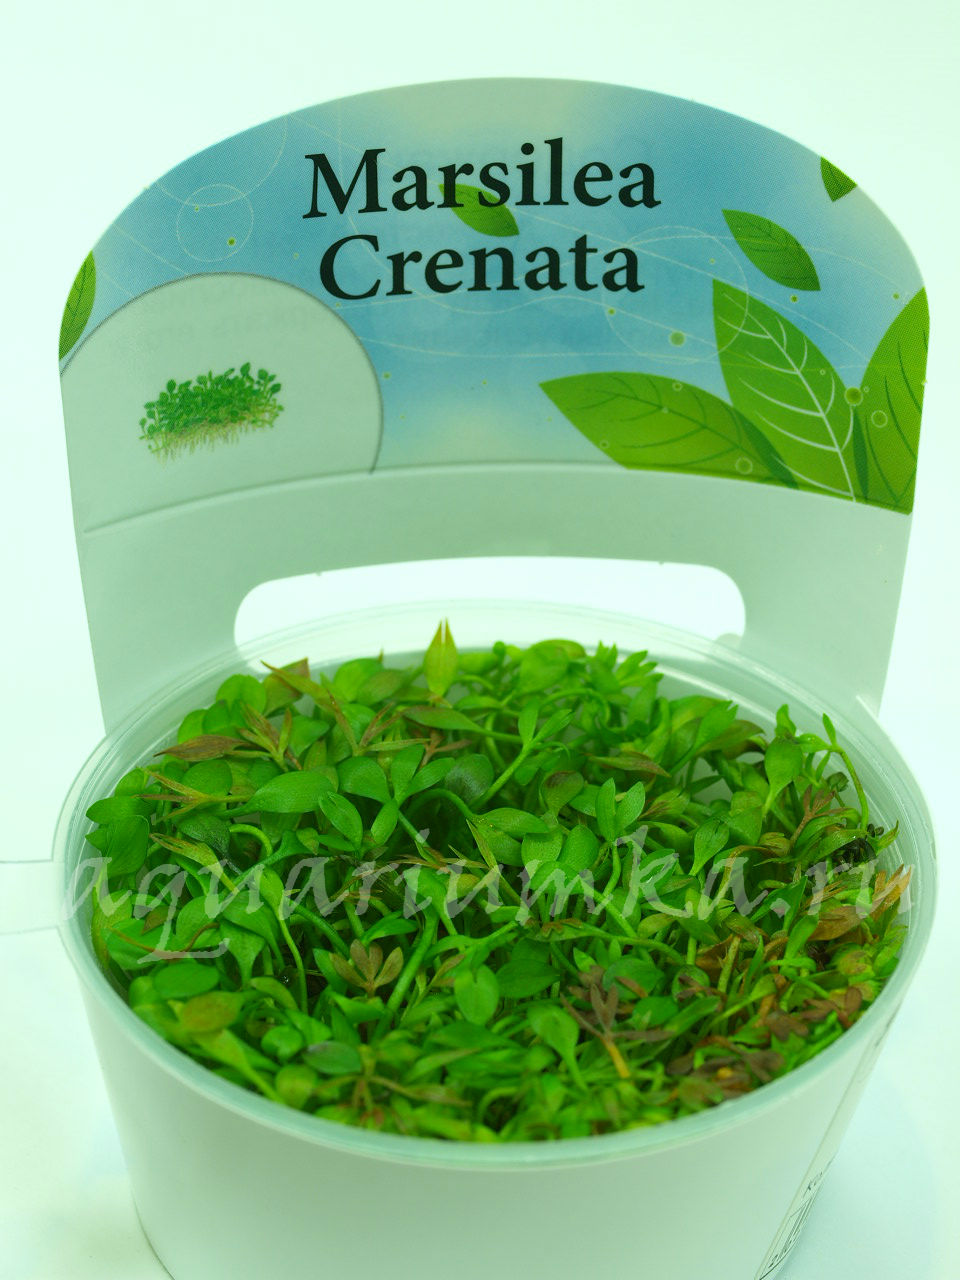 http://aquariumka.ru/wp-content/uploads/2015/06/Marsilea-Crenata.jpg